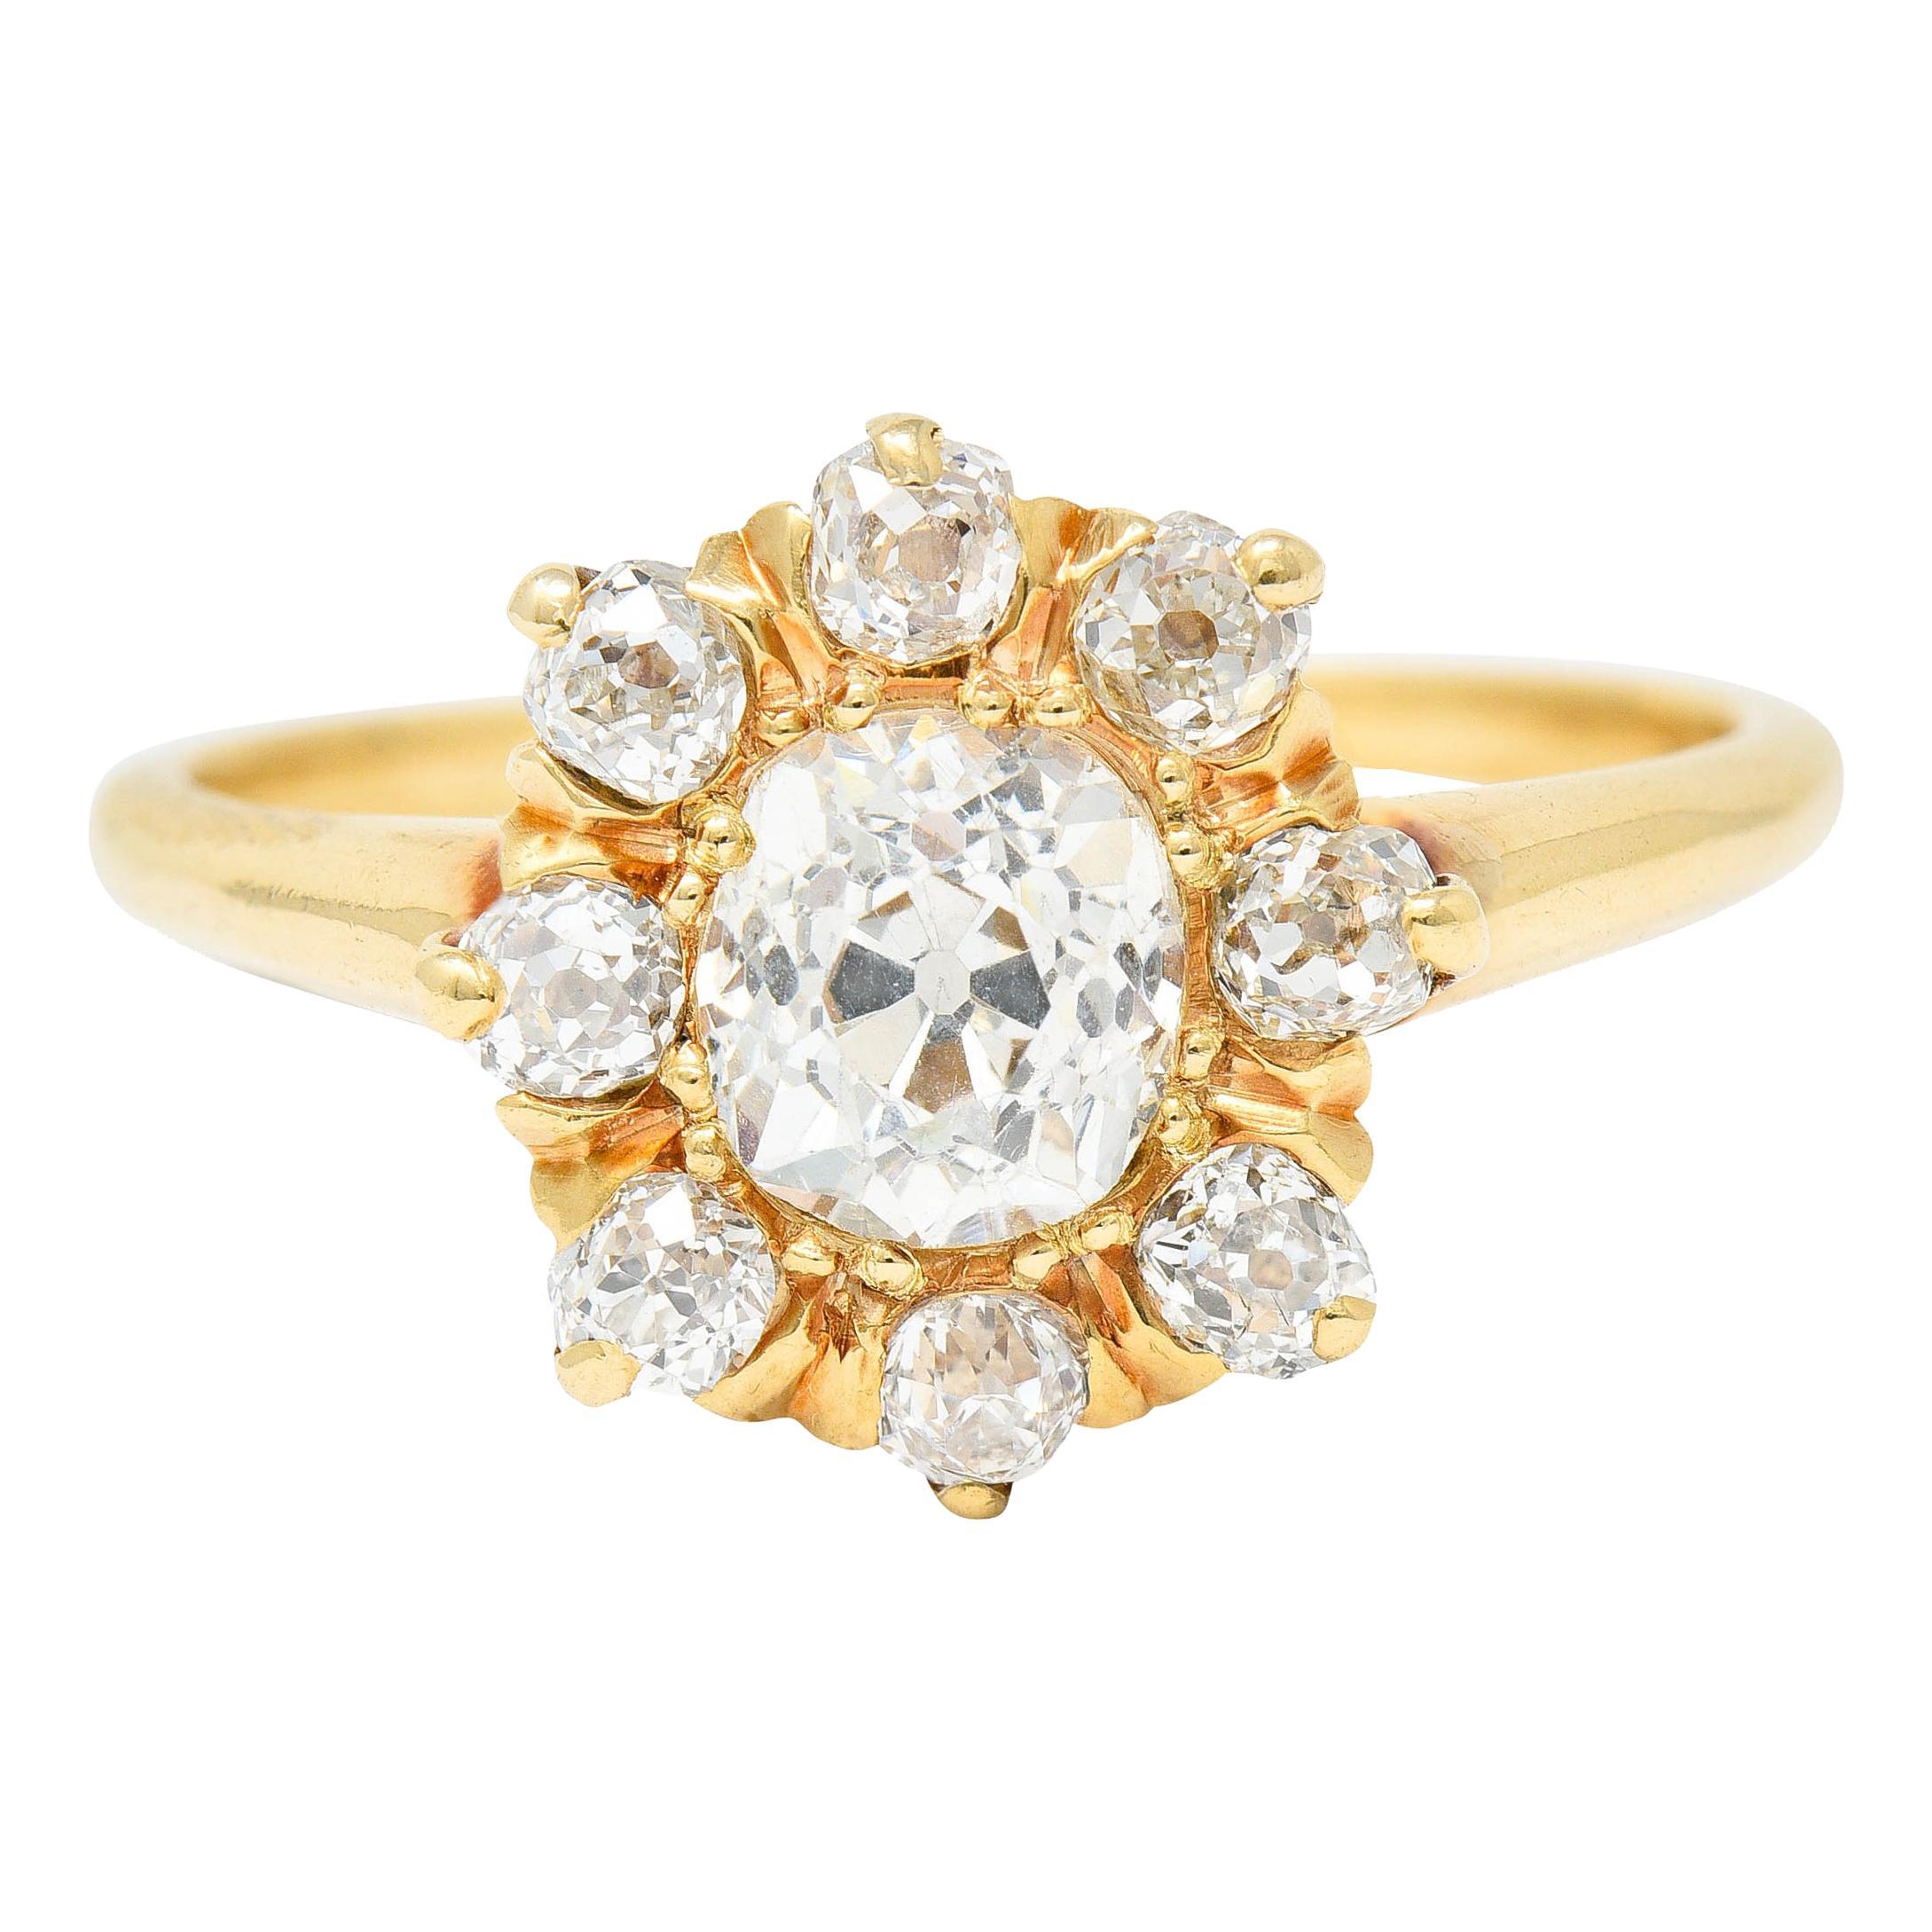 Victorian 1.60 Carats Old Mine Diamond 14 Karat Gold Cluster Ring